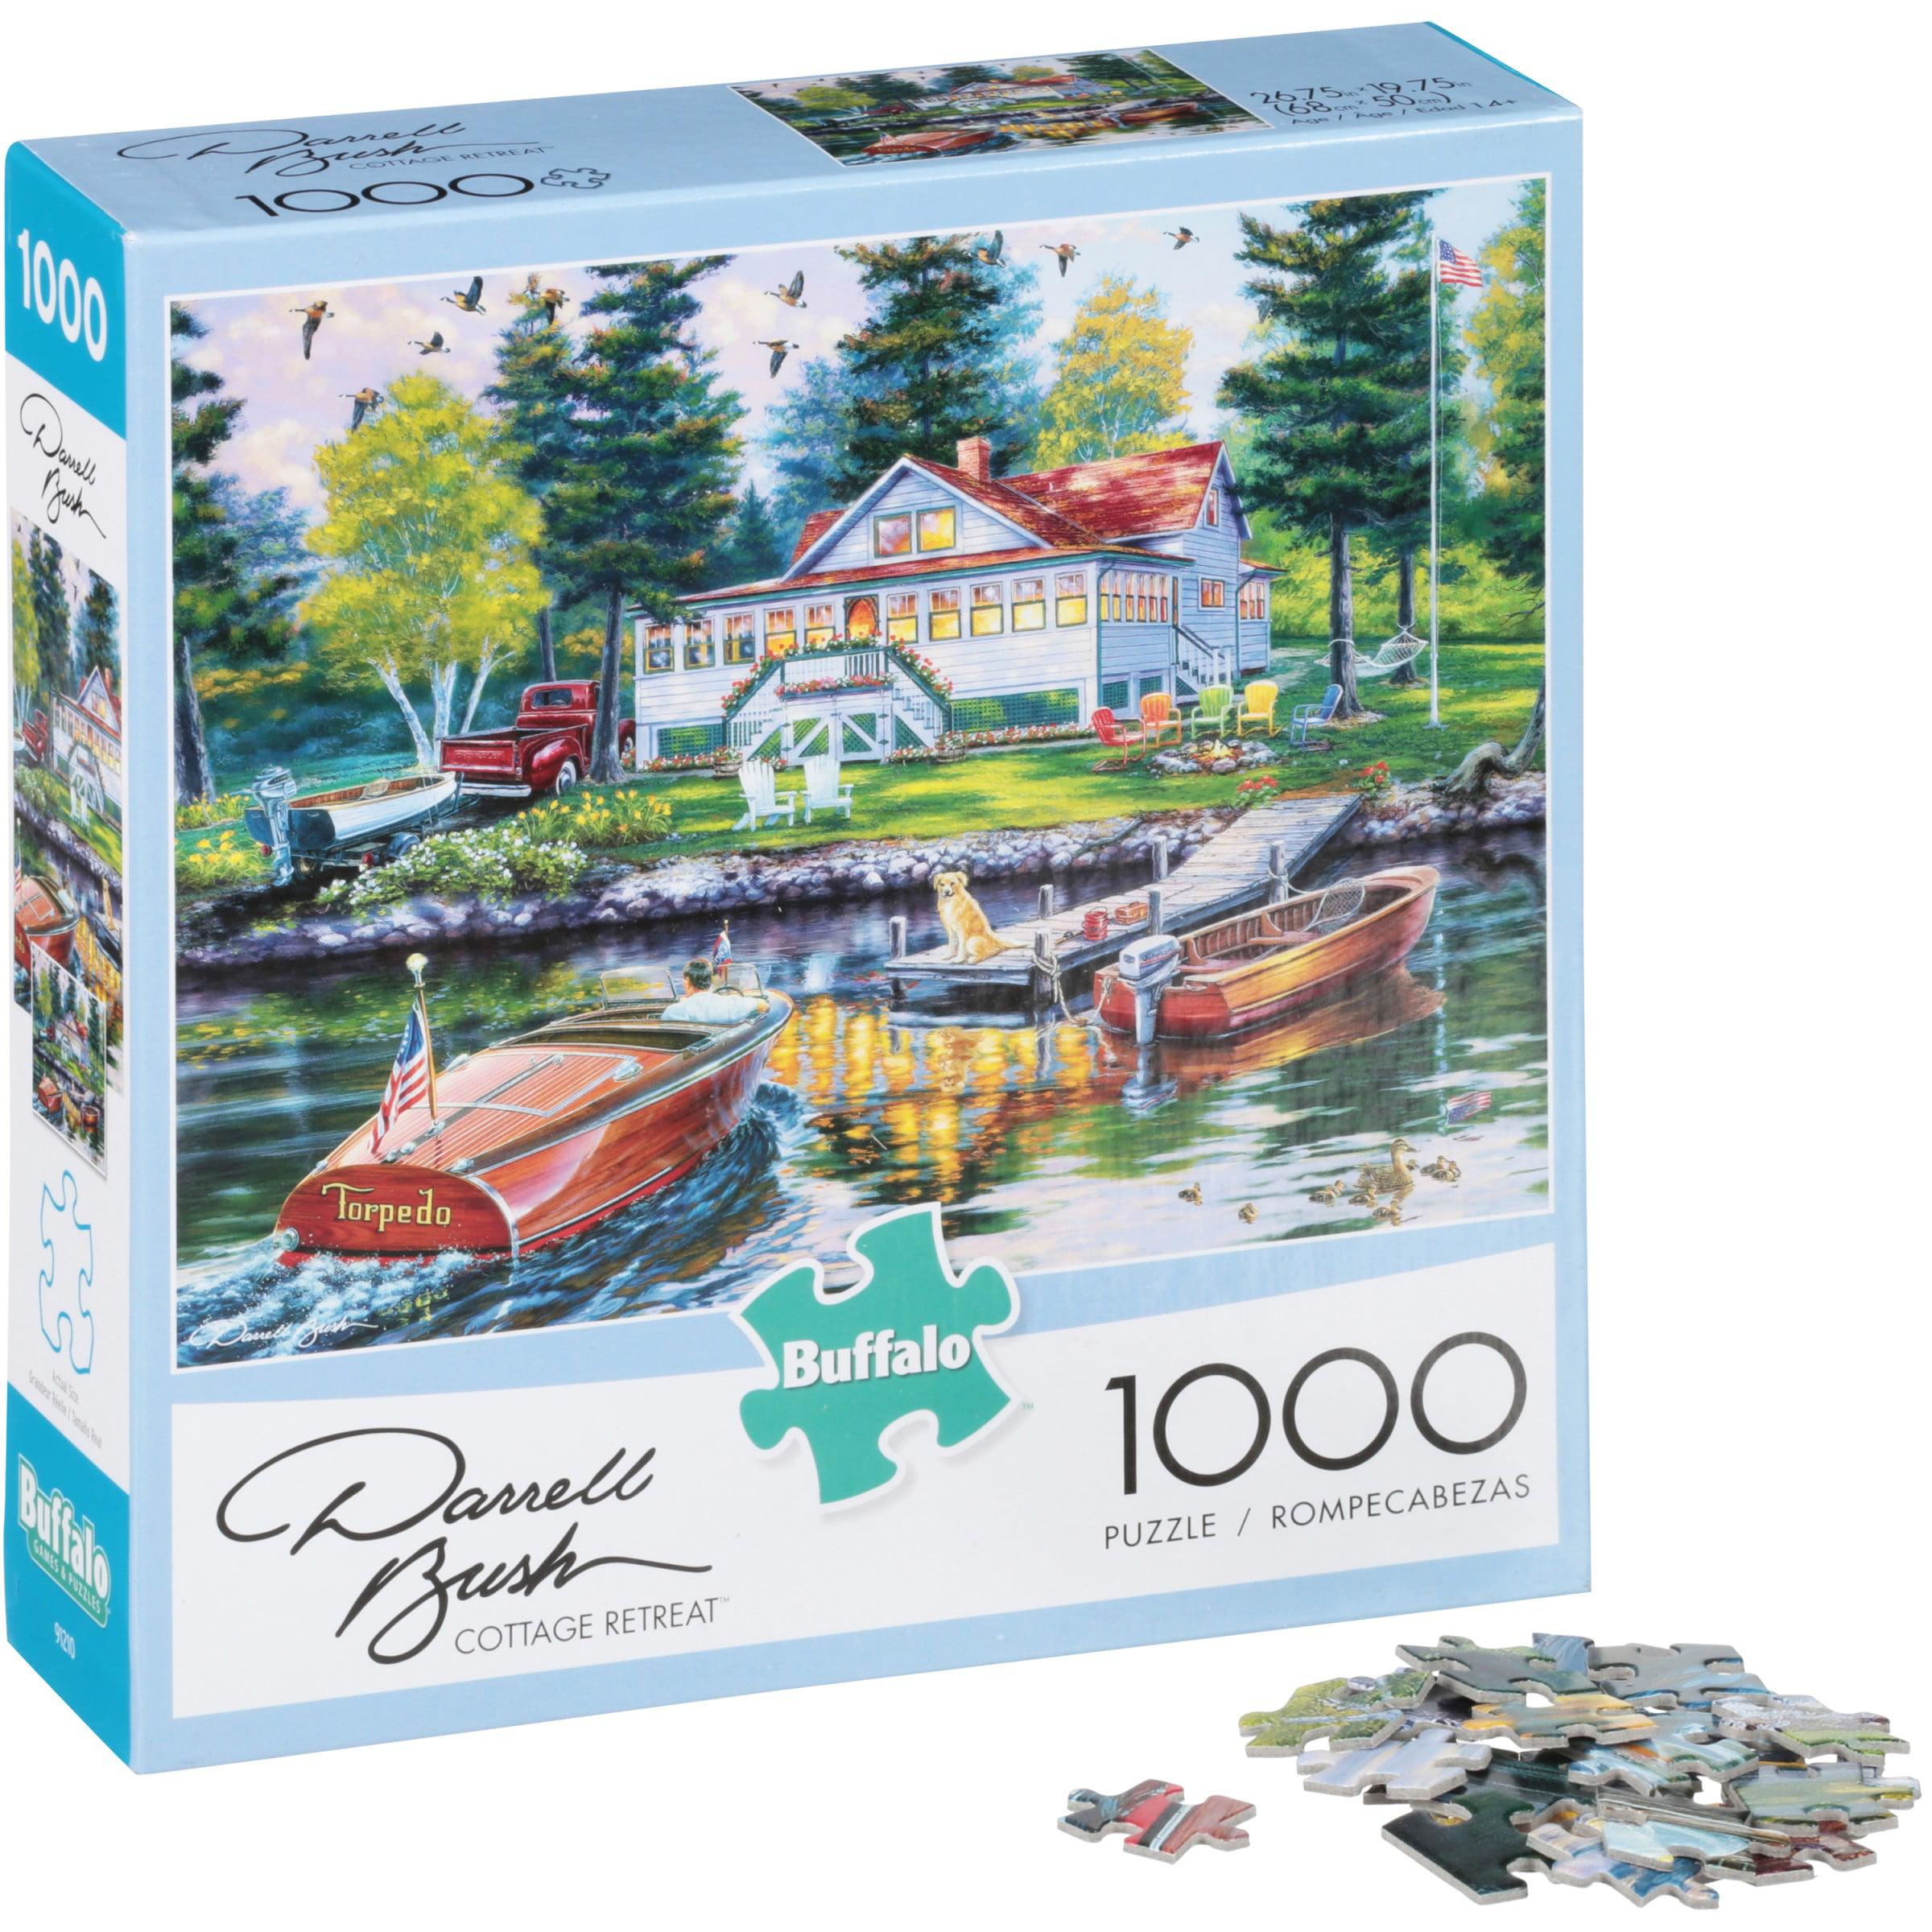 Buffalo™ Darrell Bush Cottage Retreat™ 1000 pc Puzzle